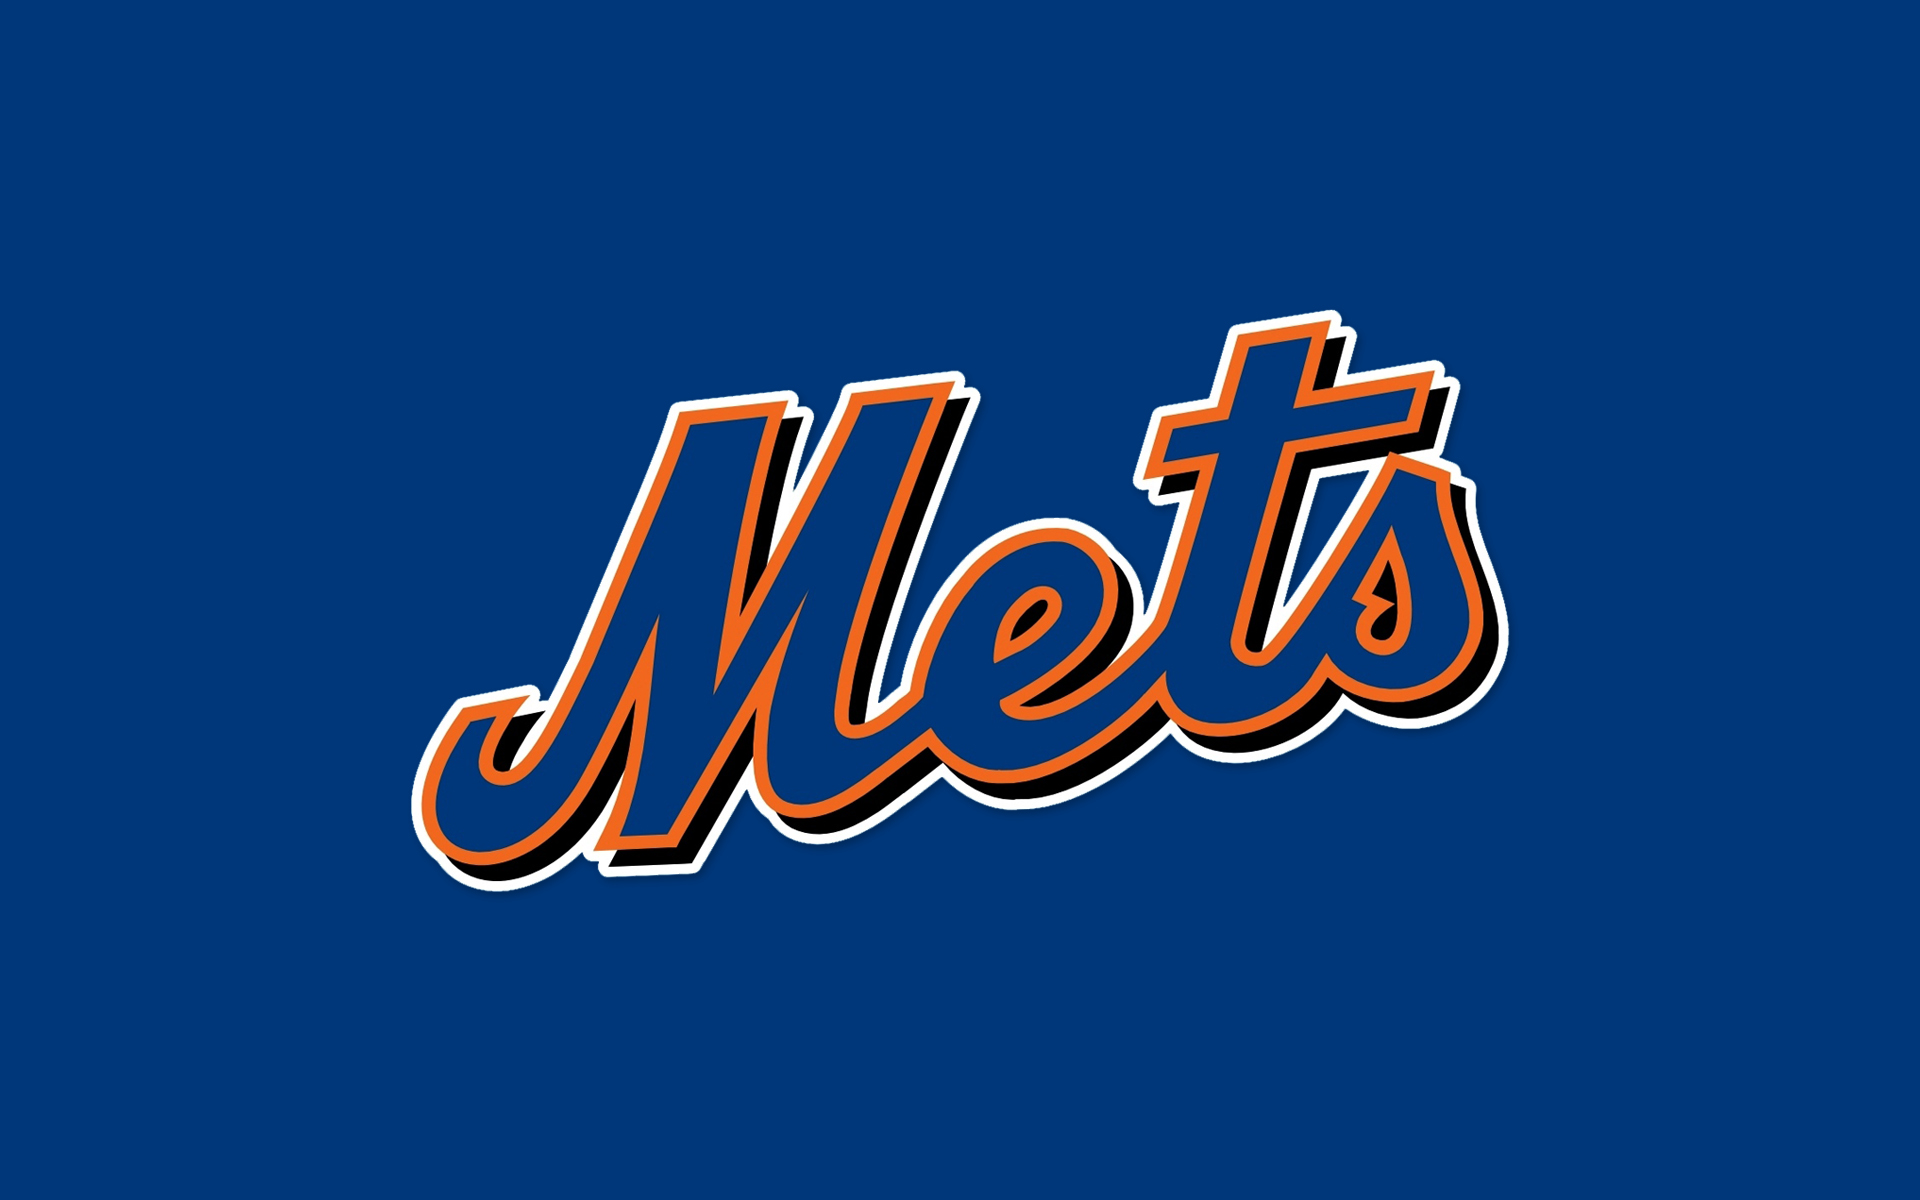 New York Mets Wallpaper Hd 12 Hd New York Mets Wallpapers